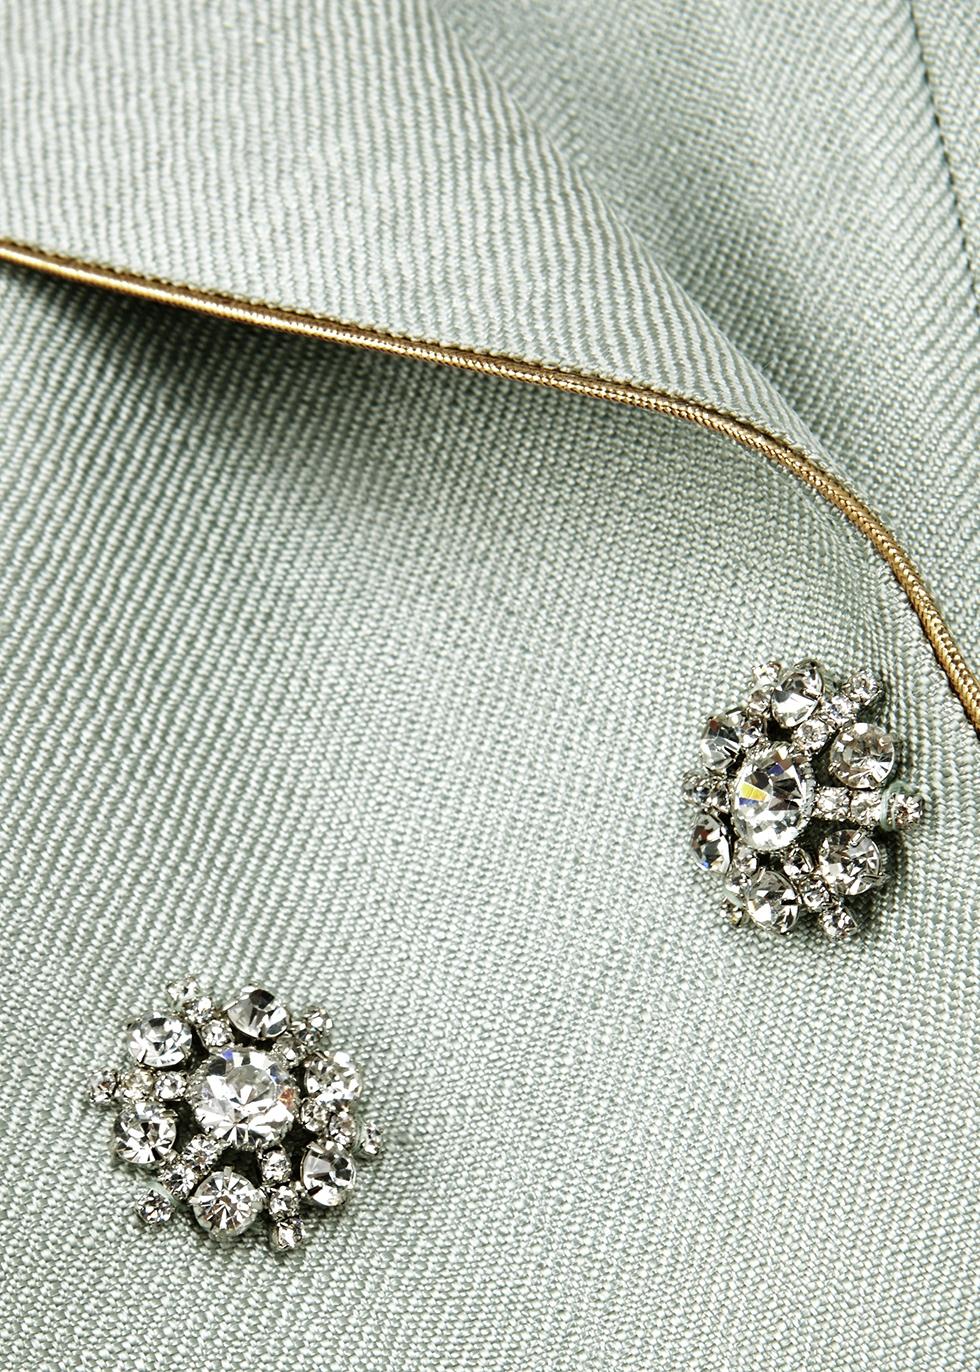 Mint embellished twill waistcoat - Peter Pilotto